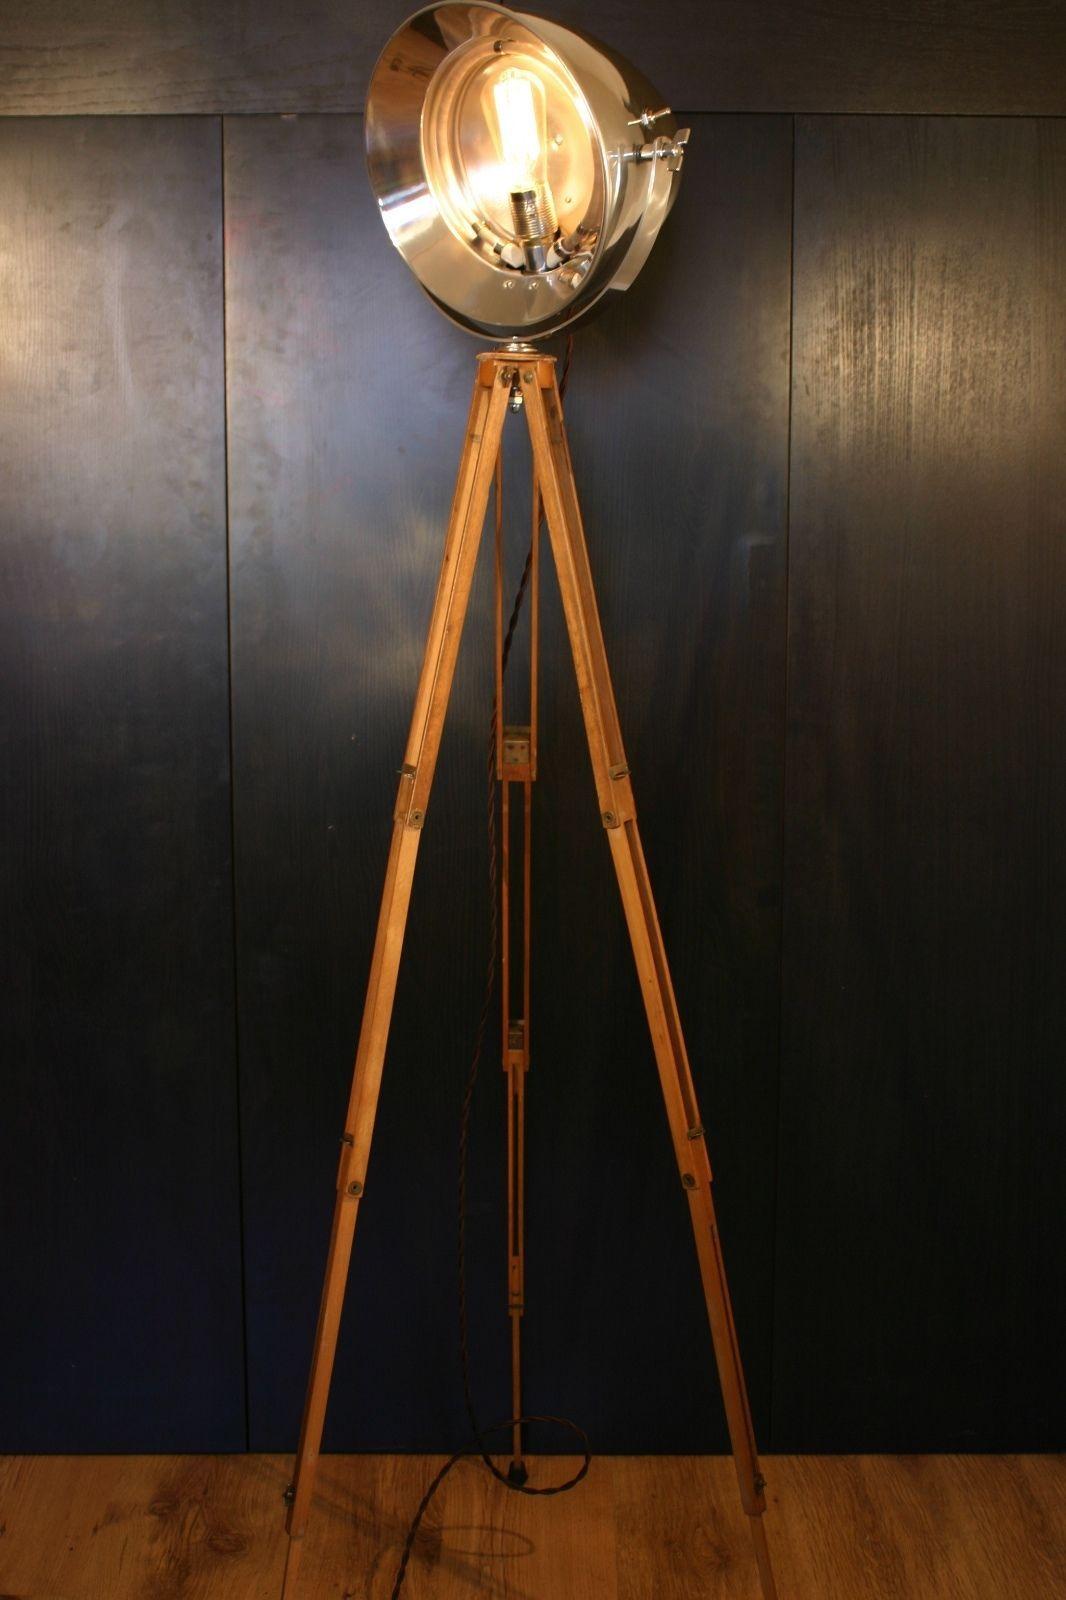 Old Medical Tripod Lamp 1951 Year Industrial Retro Floor Lamp | EBay